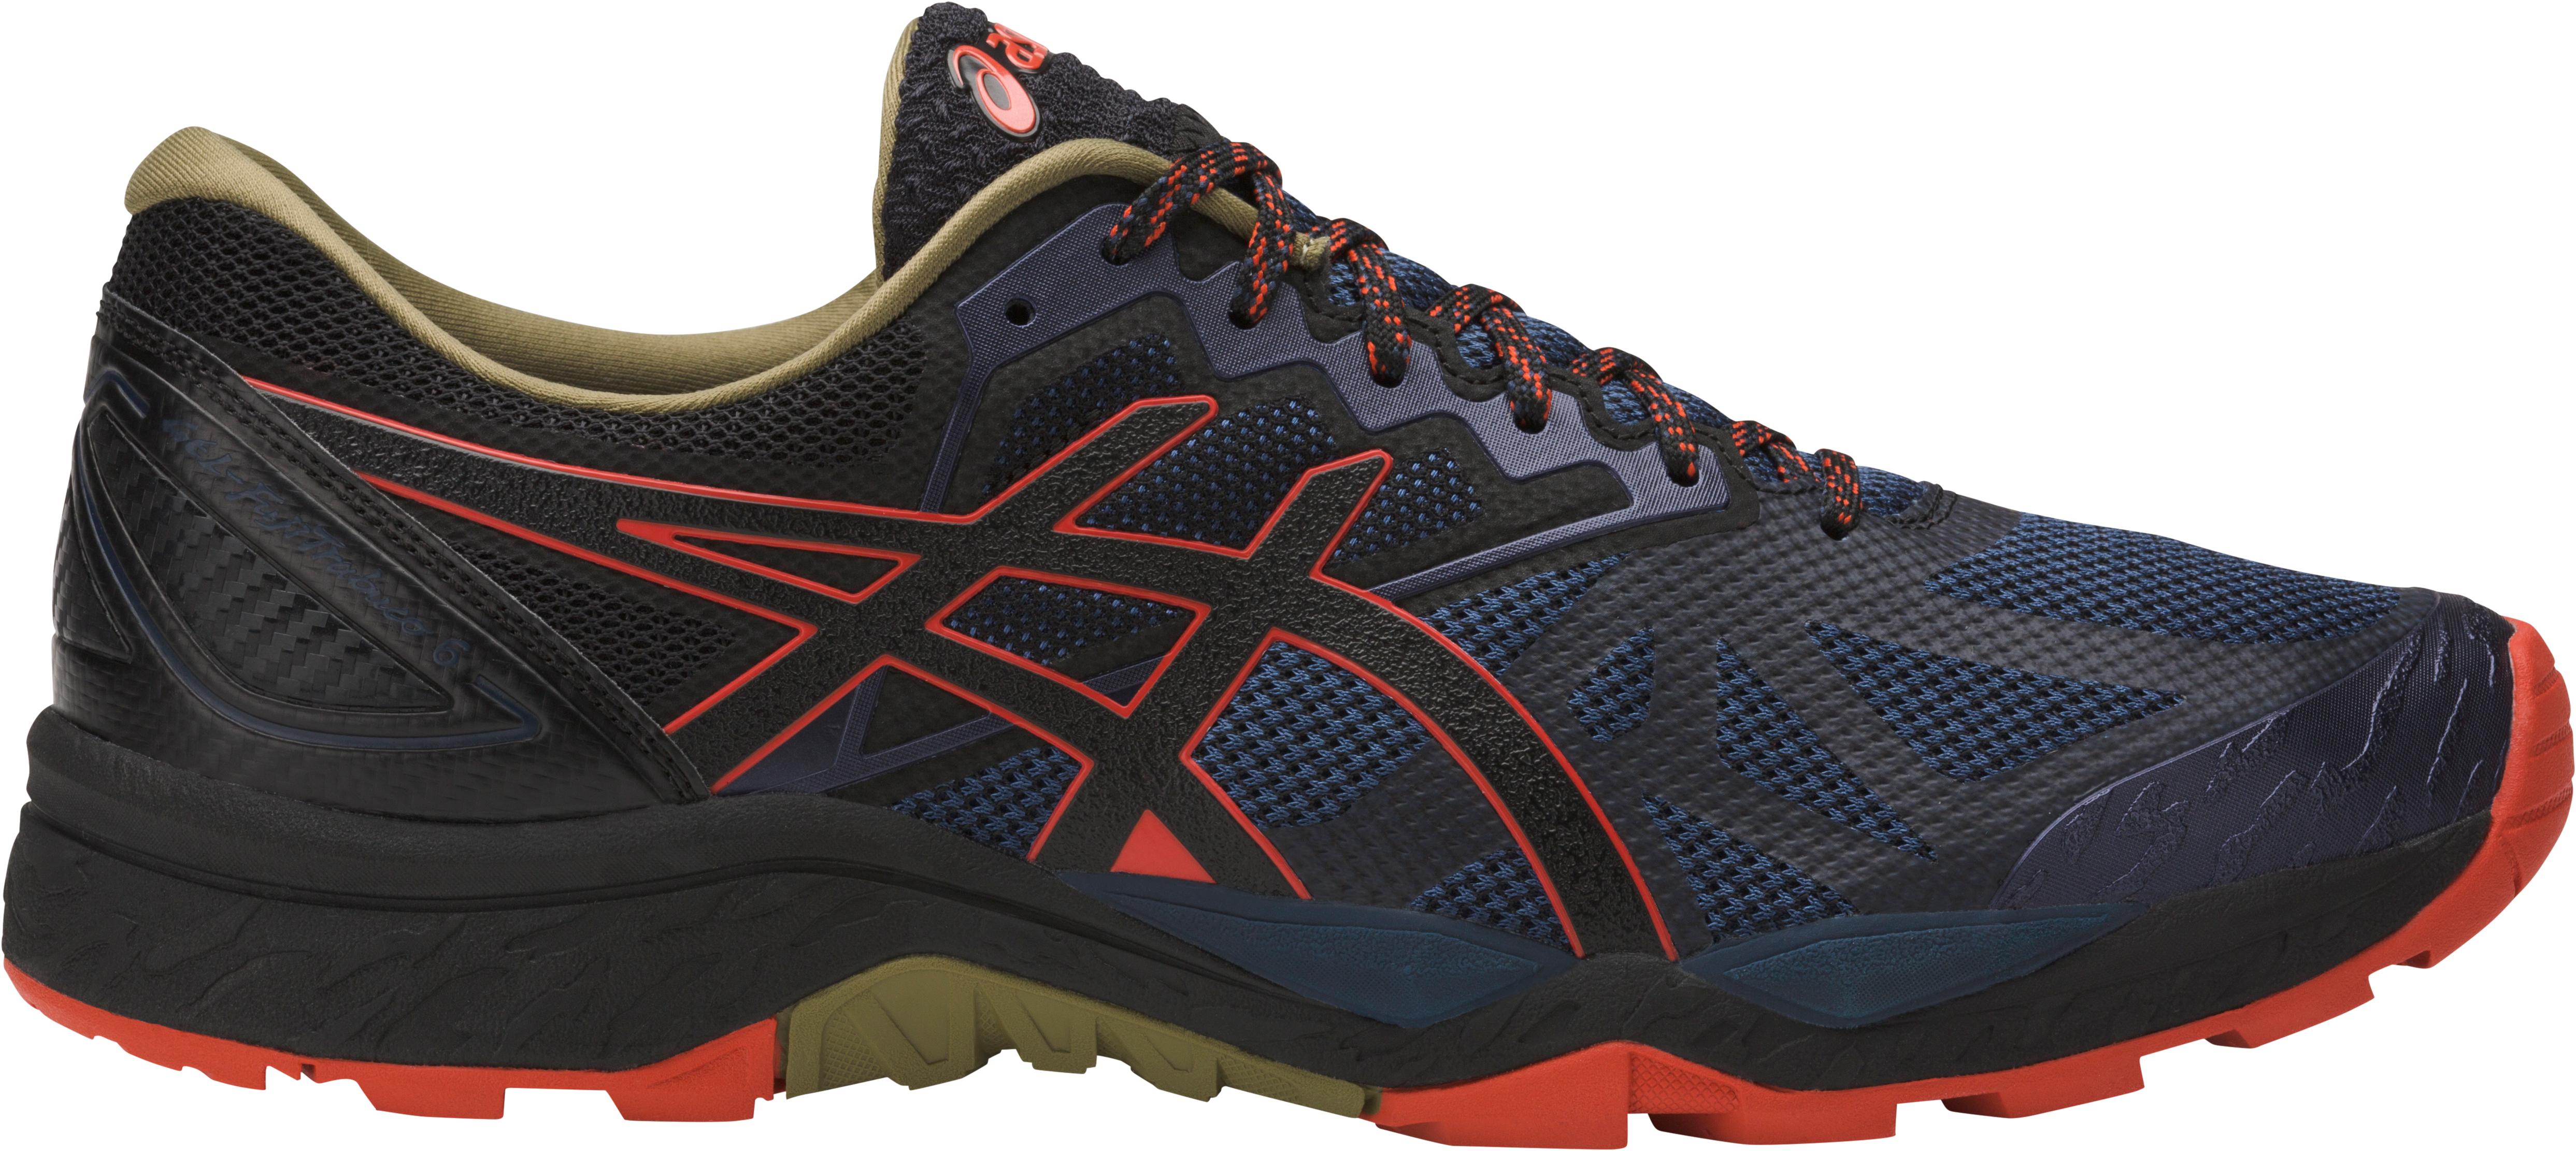 Asics 13442 Chaussures pour pour le le trail running a51c983 - swzone.info